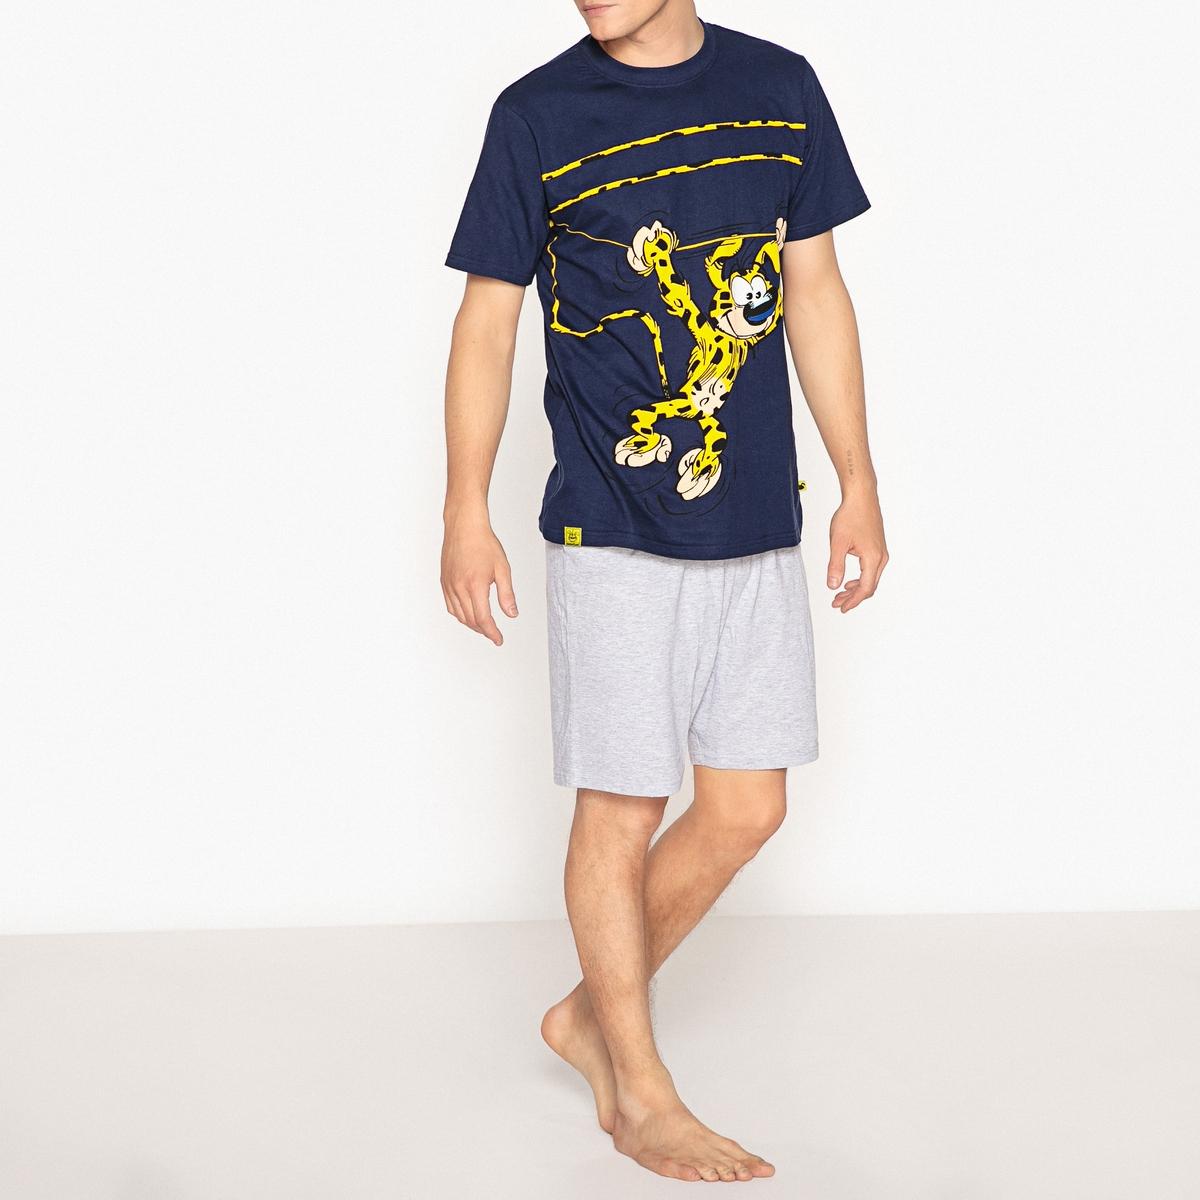 Пижама с шортами из хлопка с рисунком Marsupilami marsupilami